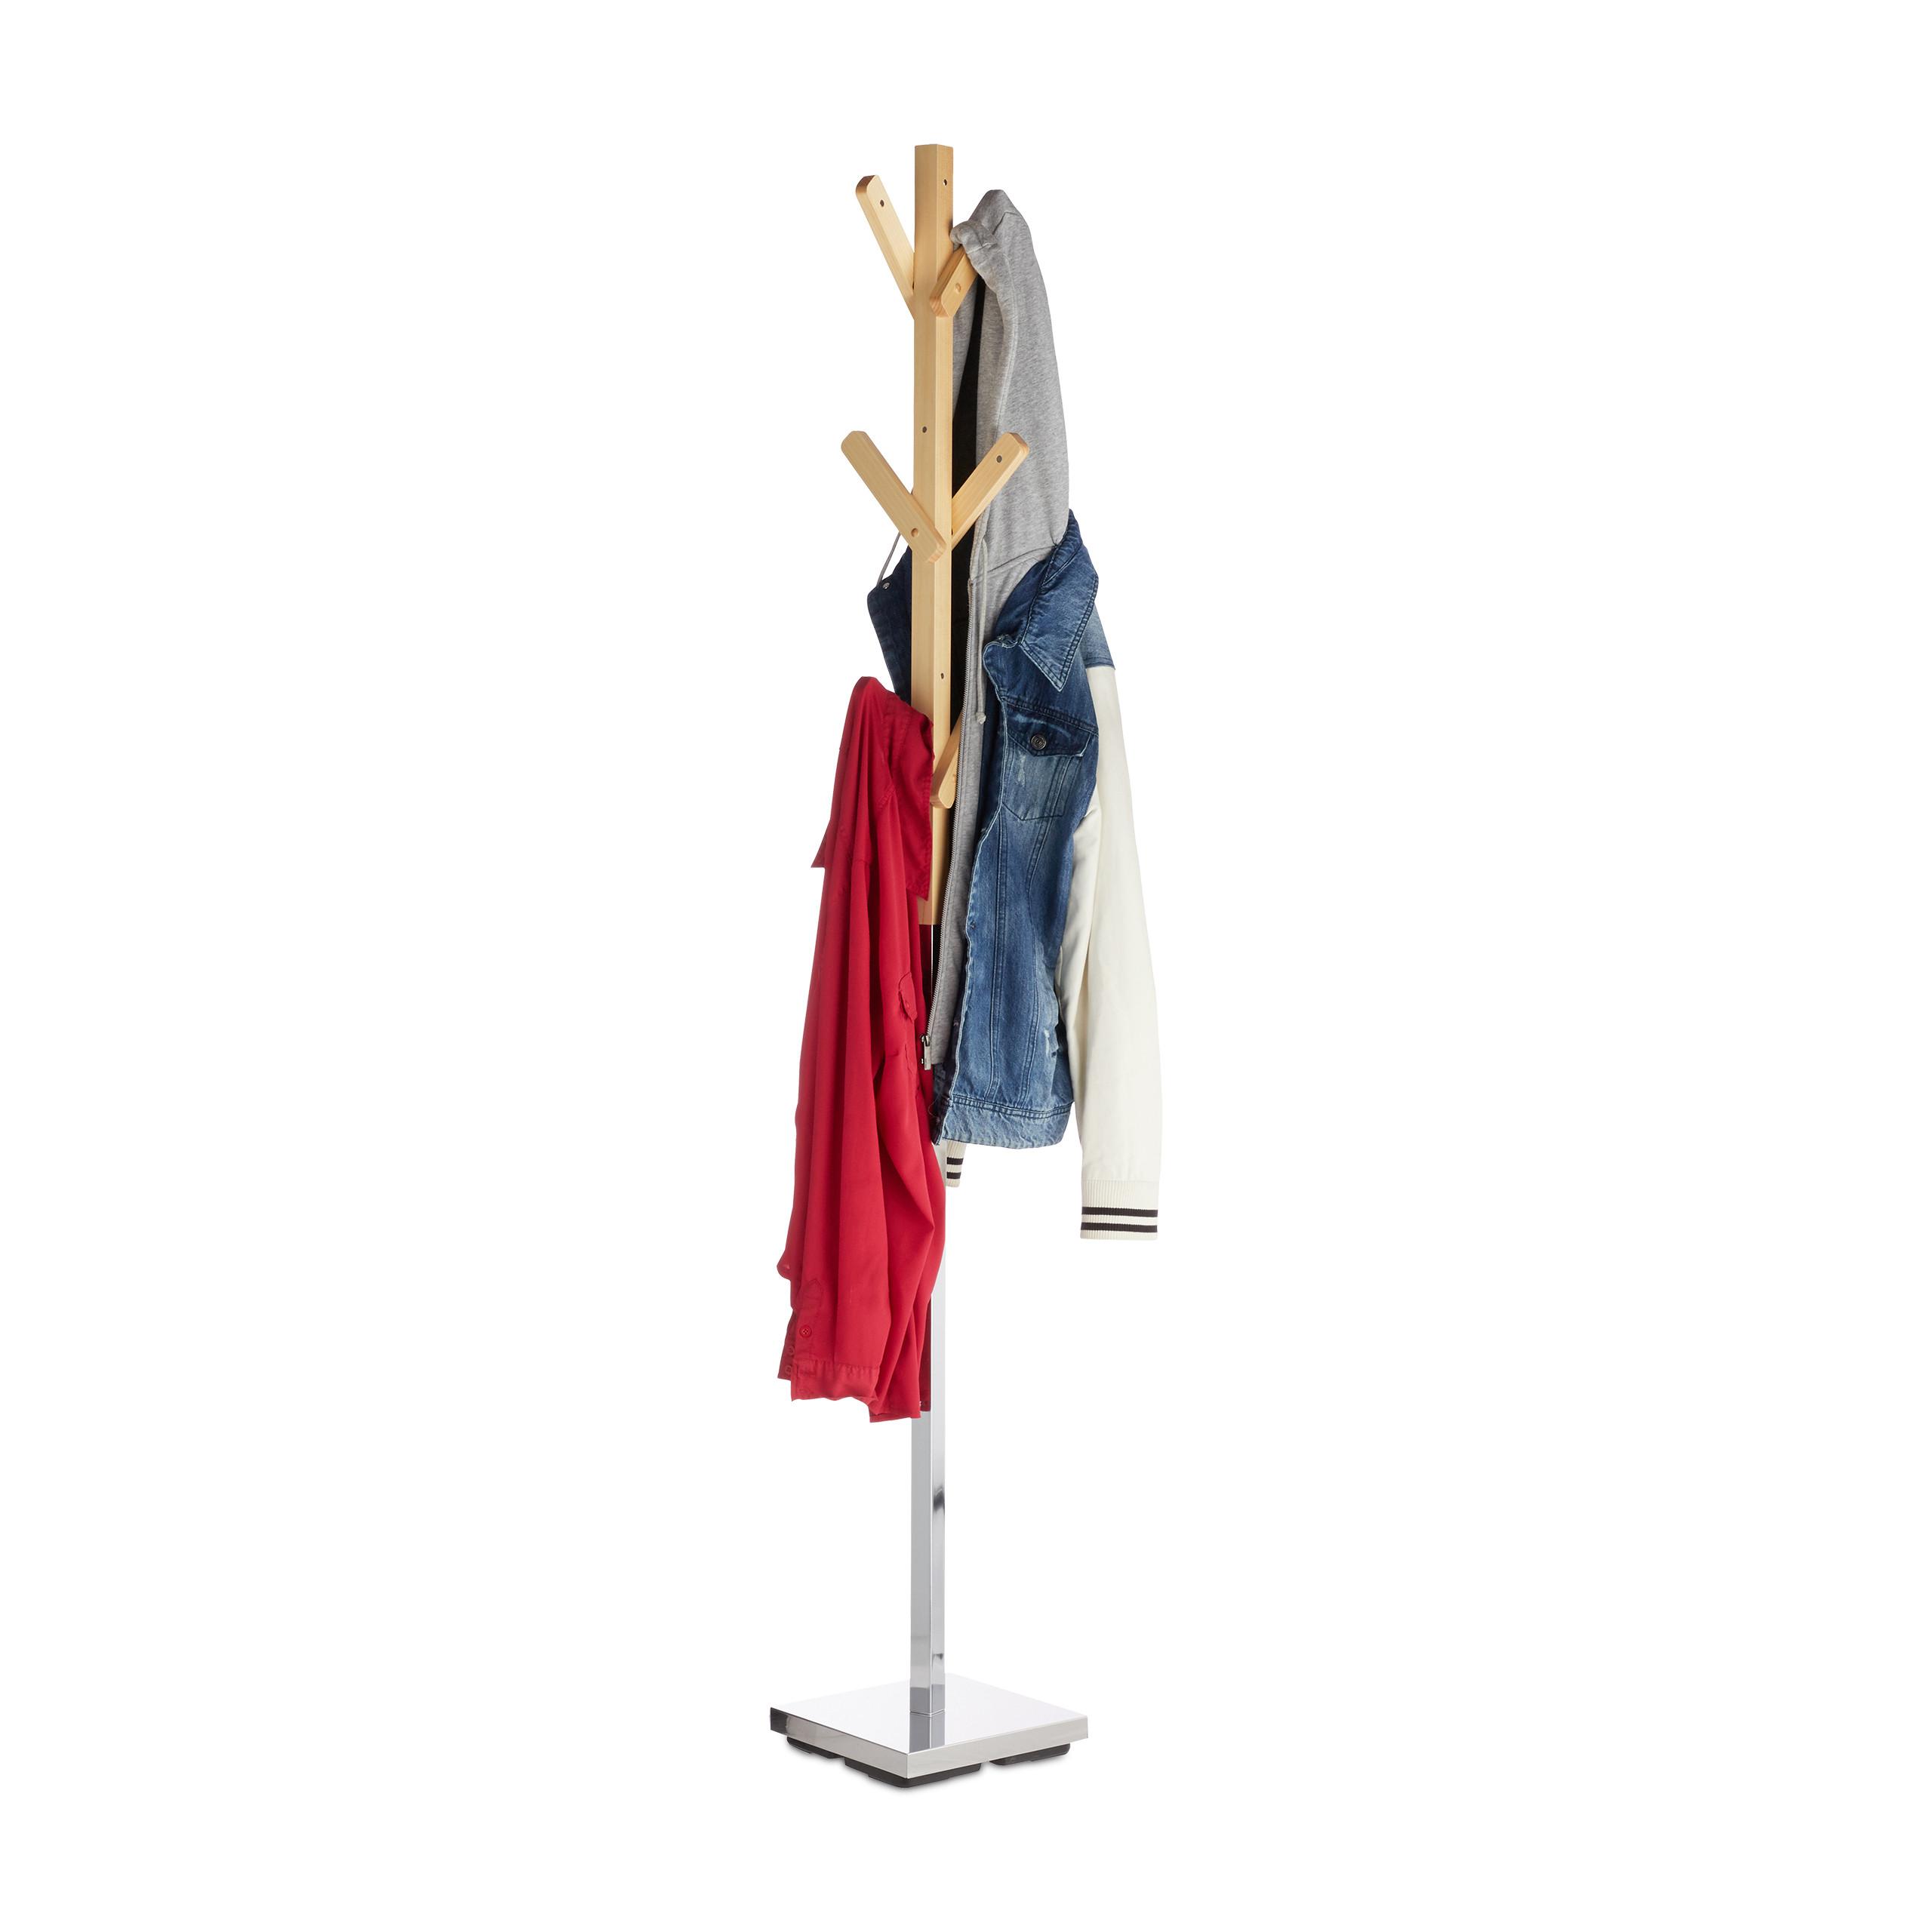 Garderobenständer Metall Garderobe Standgarderobe Jackenständer Flurgarderobe